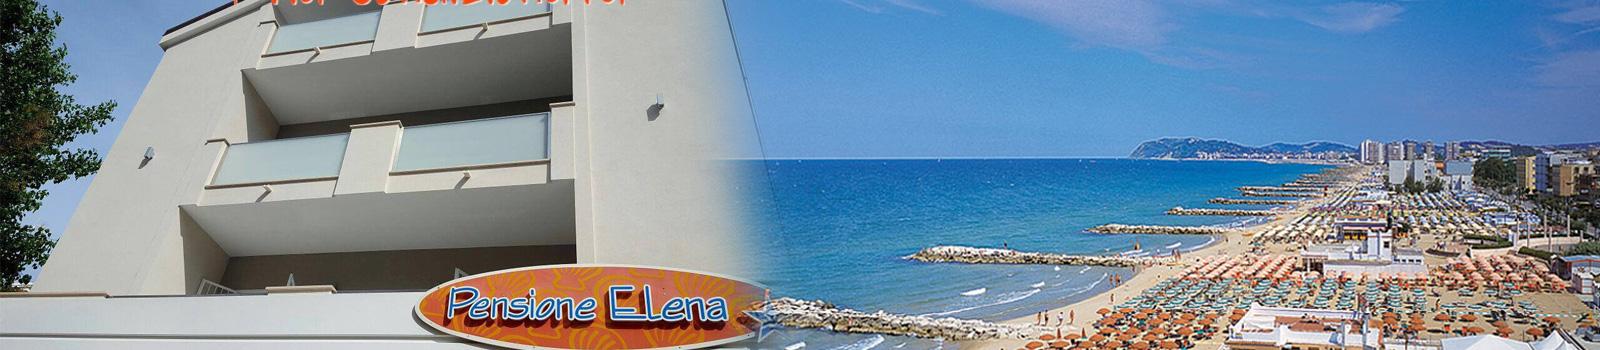 HomeElena1600x350